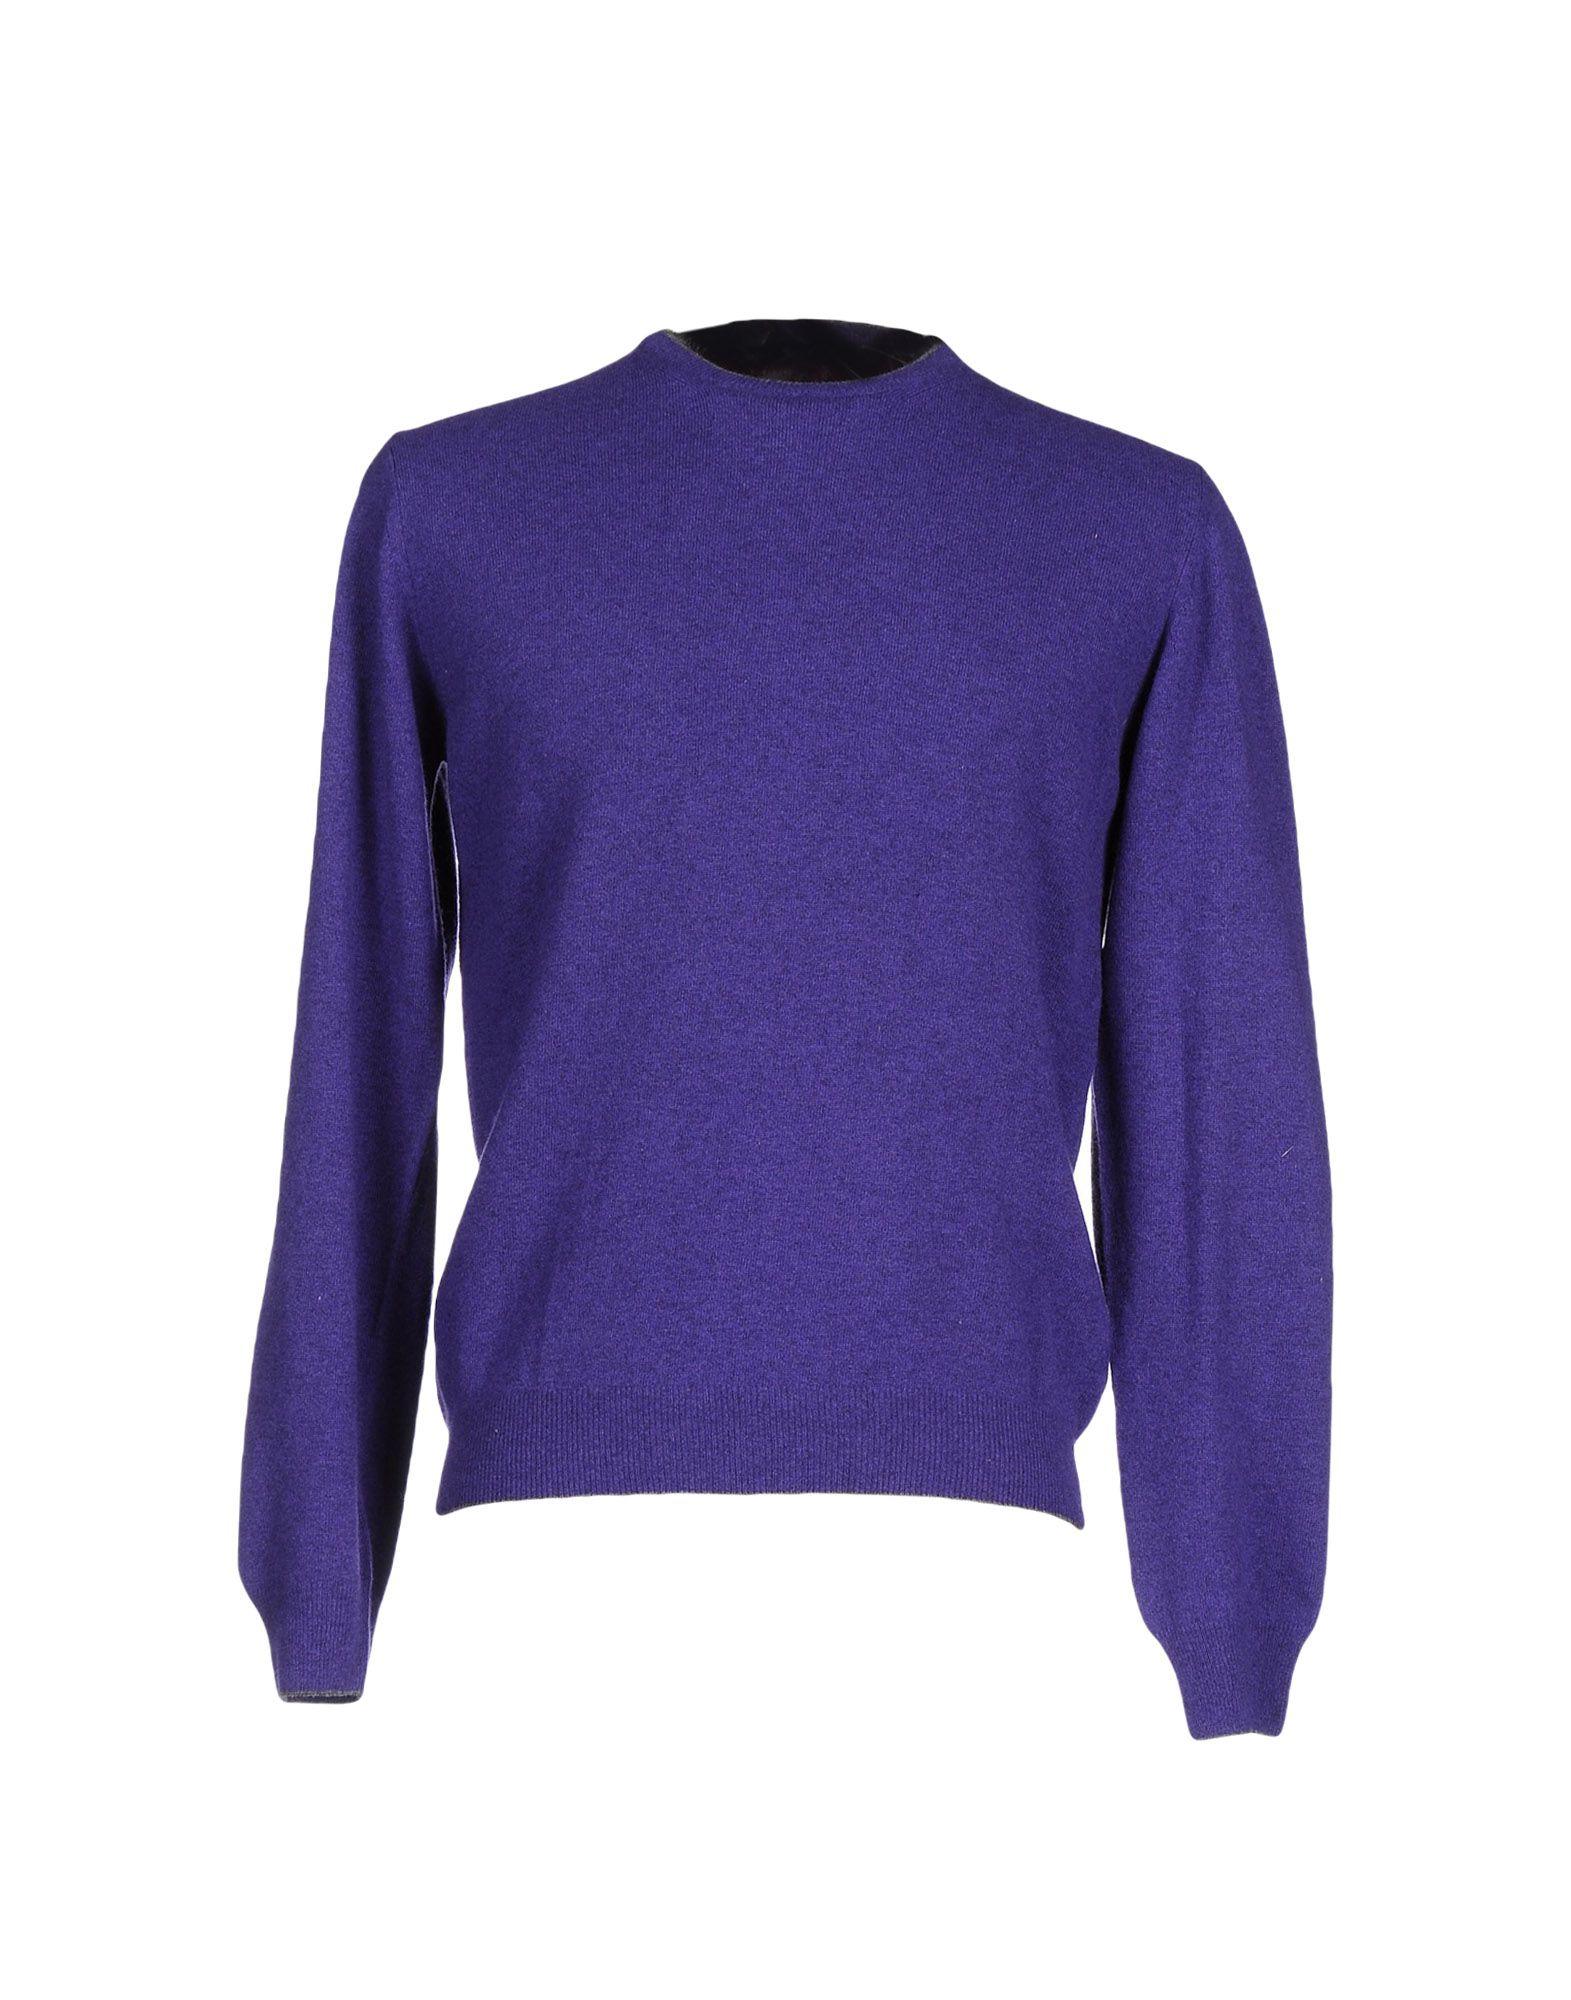 Purple Sweater For Men 55